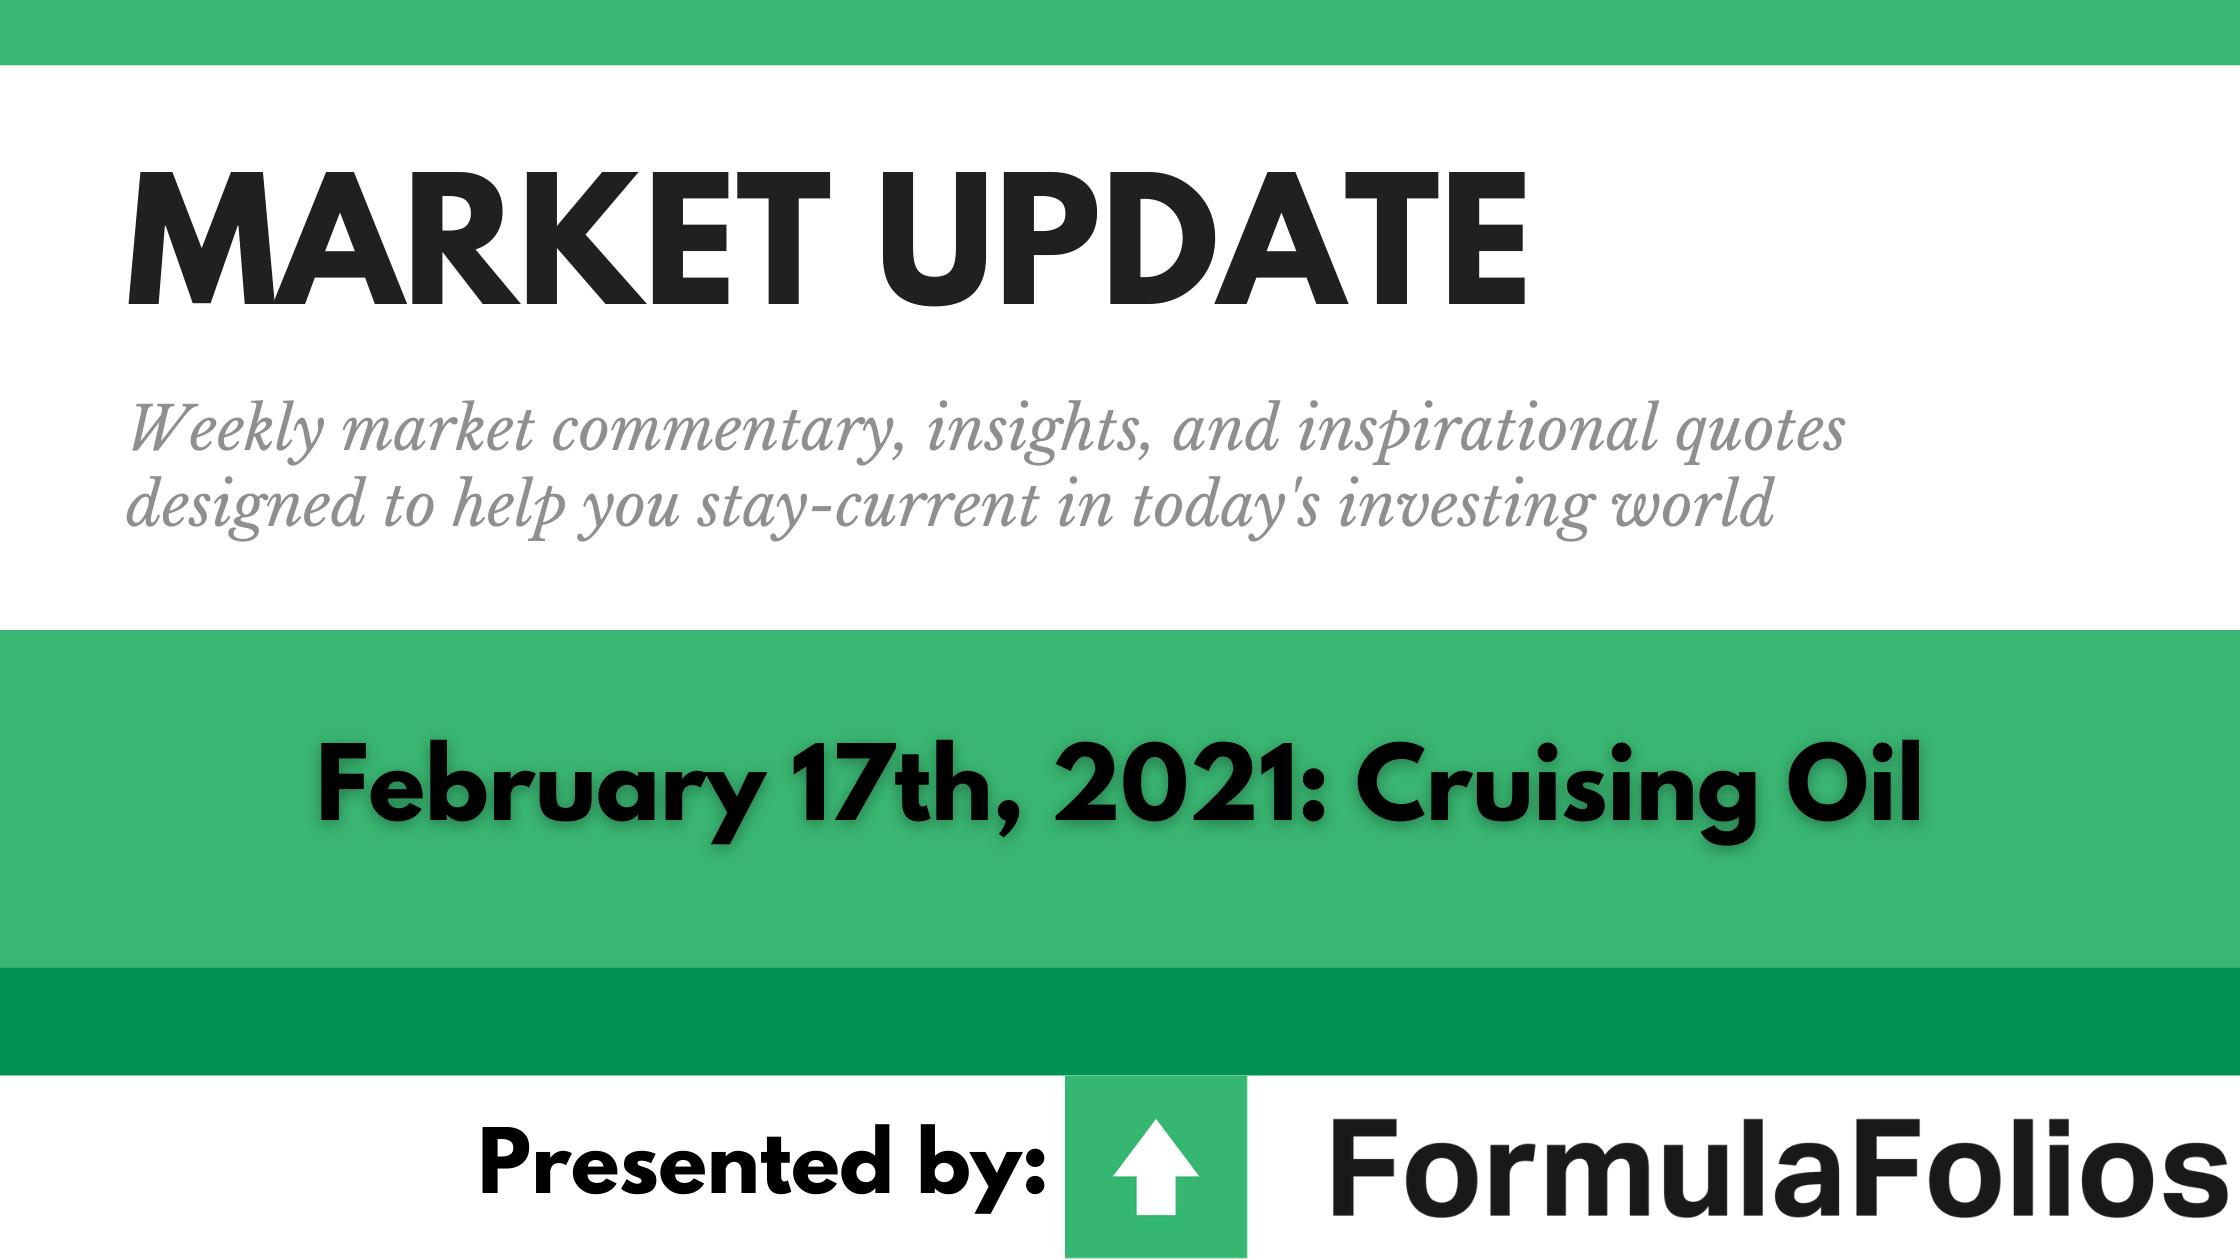 Market Update: Cruising Oil